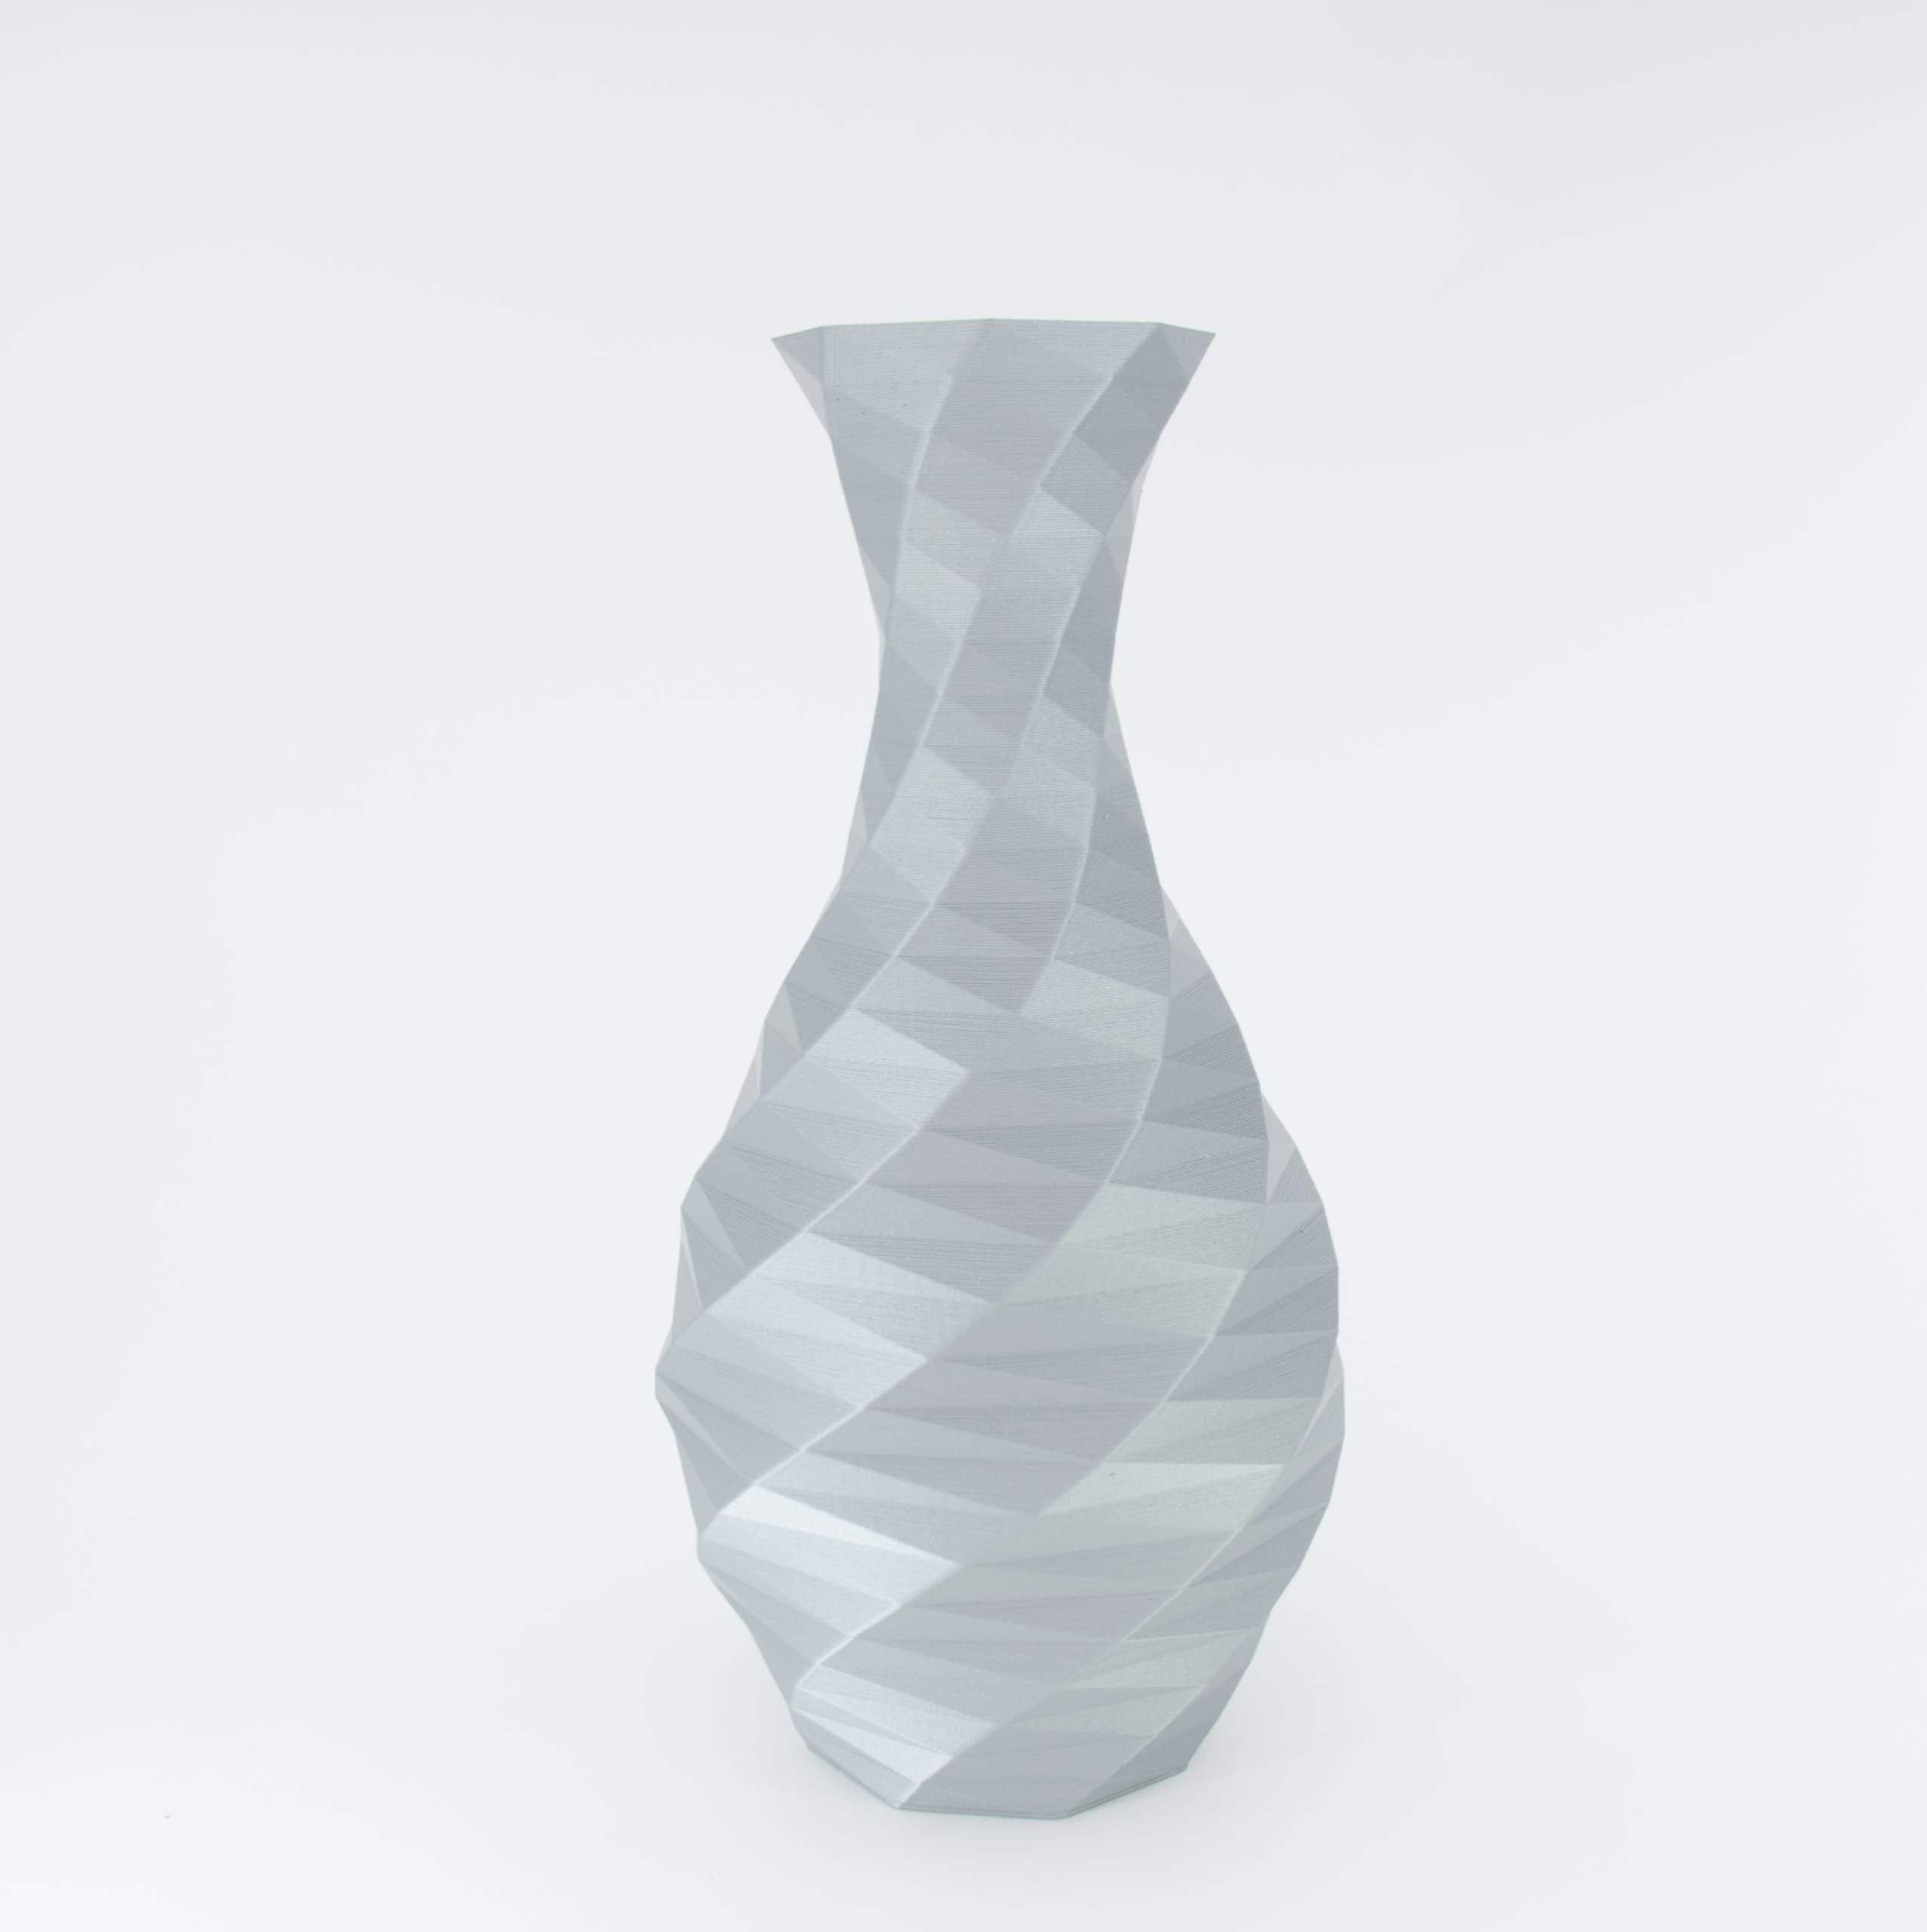 PLA אלומניום טבעי פילמנט filament